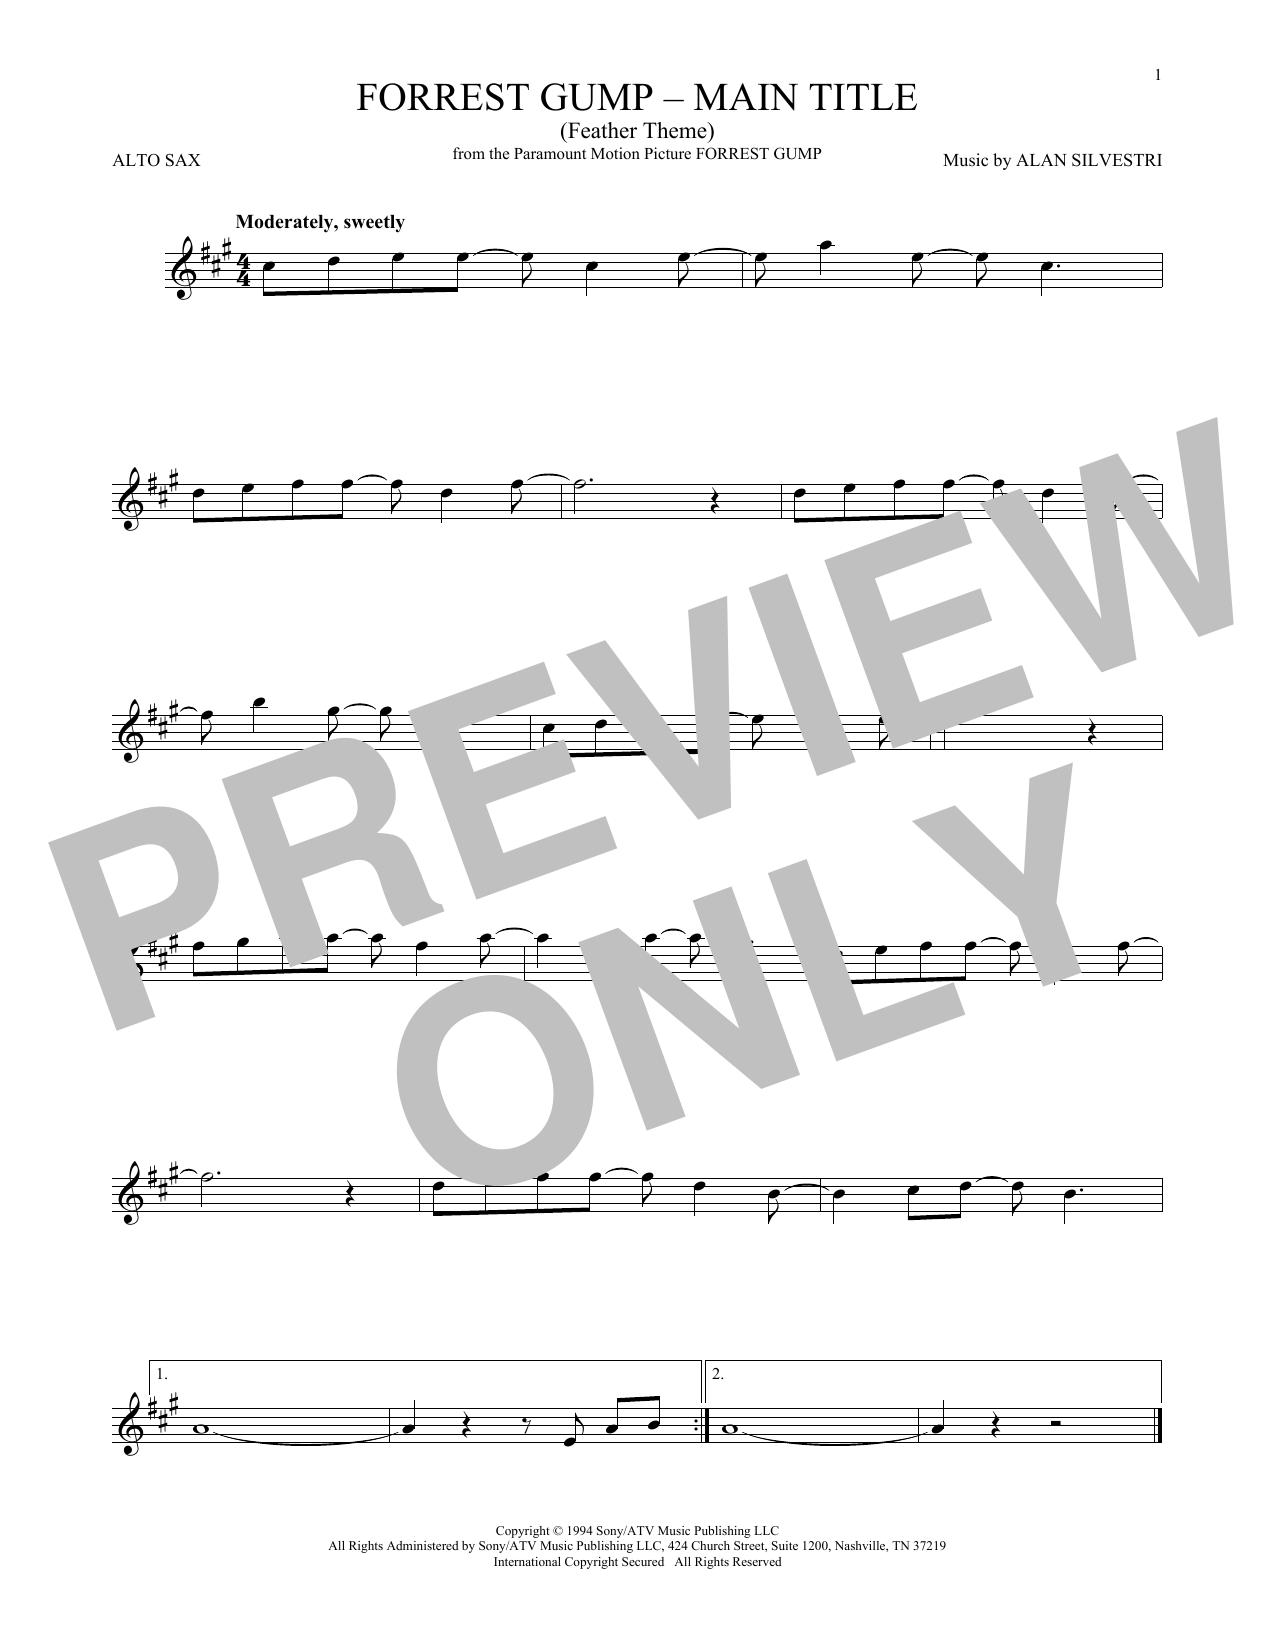 Forrest Gump - Main Title (Feather Theme) (Alto Sax Solo)